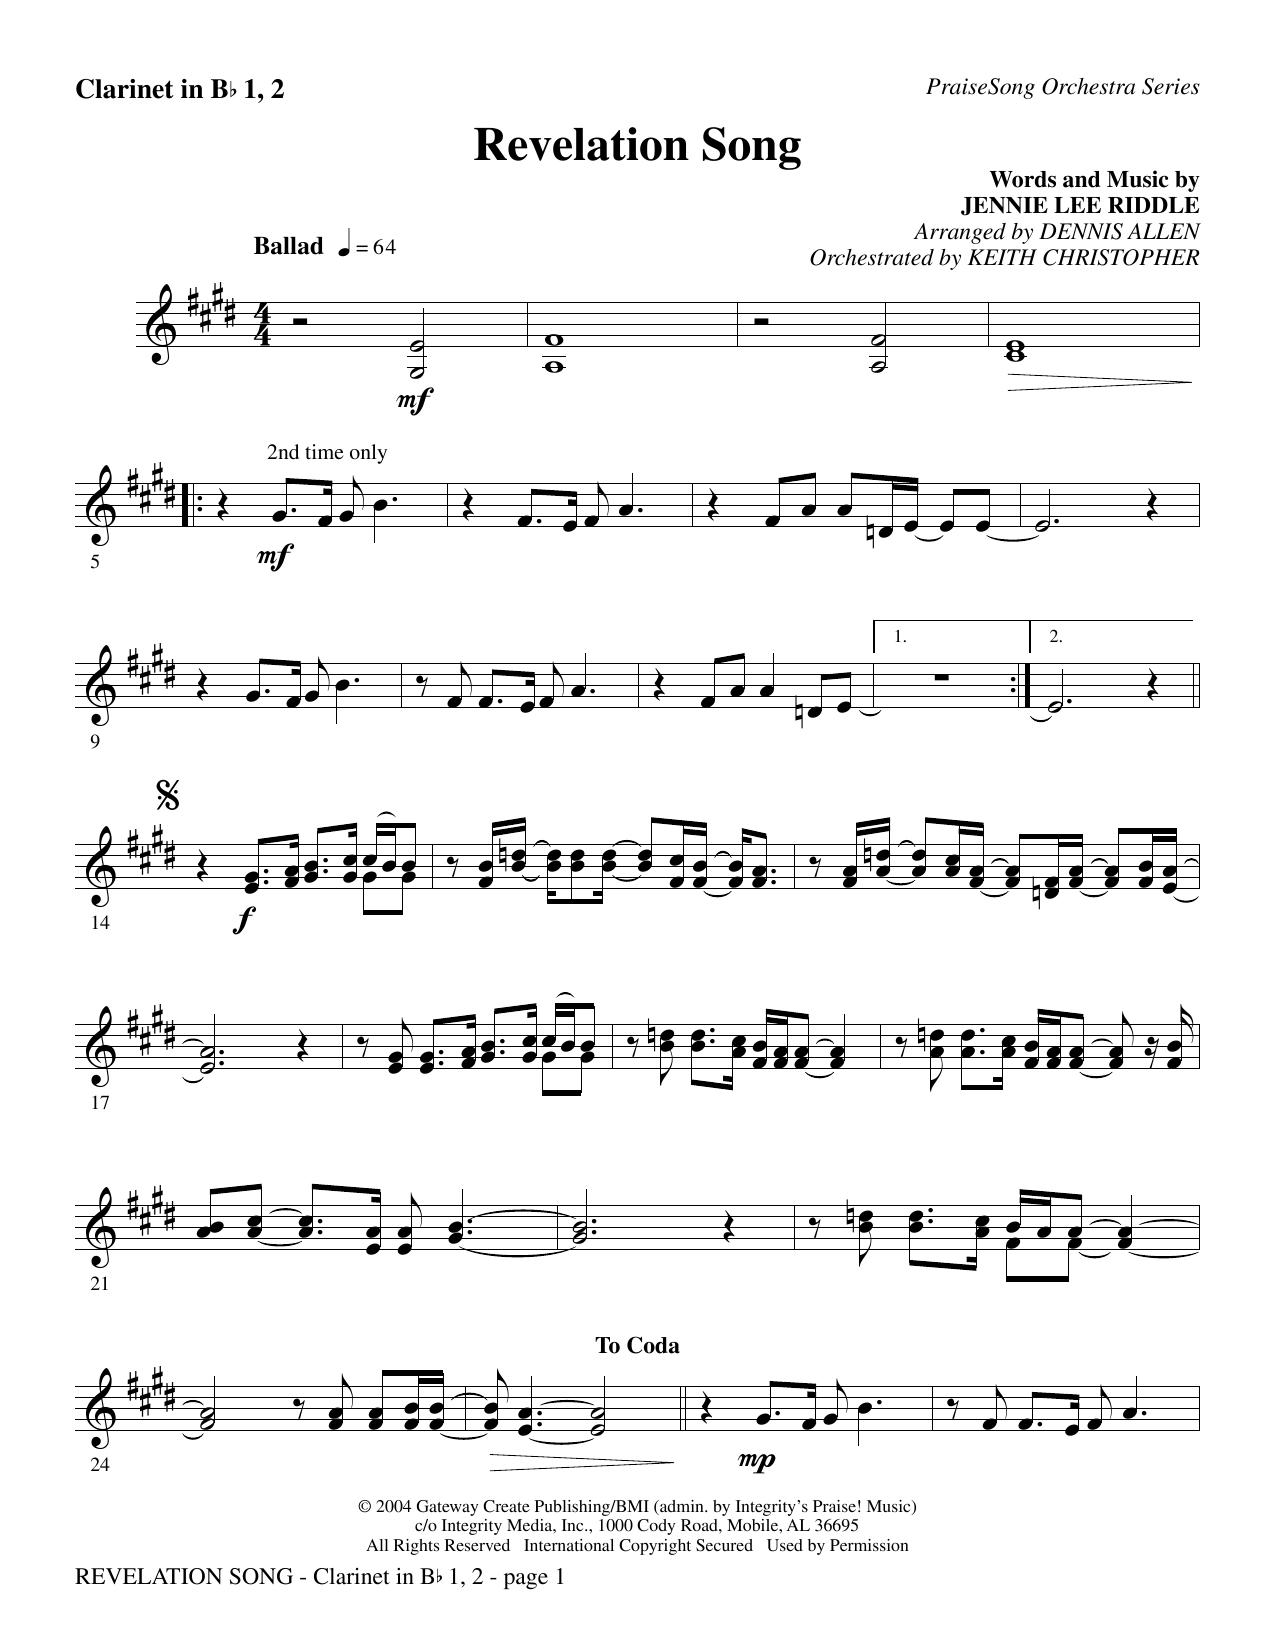 Revelation Song - Clarinet 1 & 2 Sheet Music